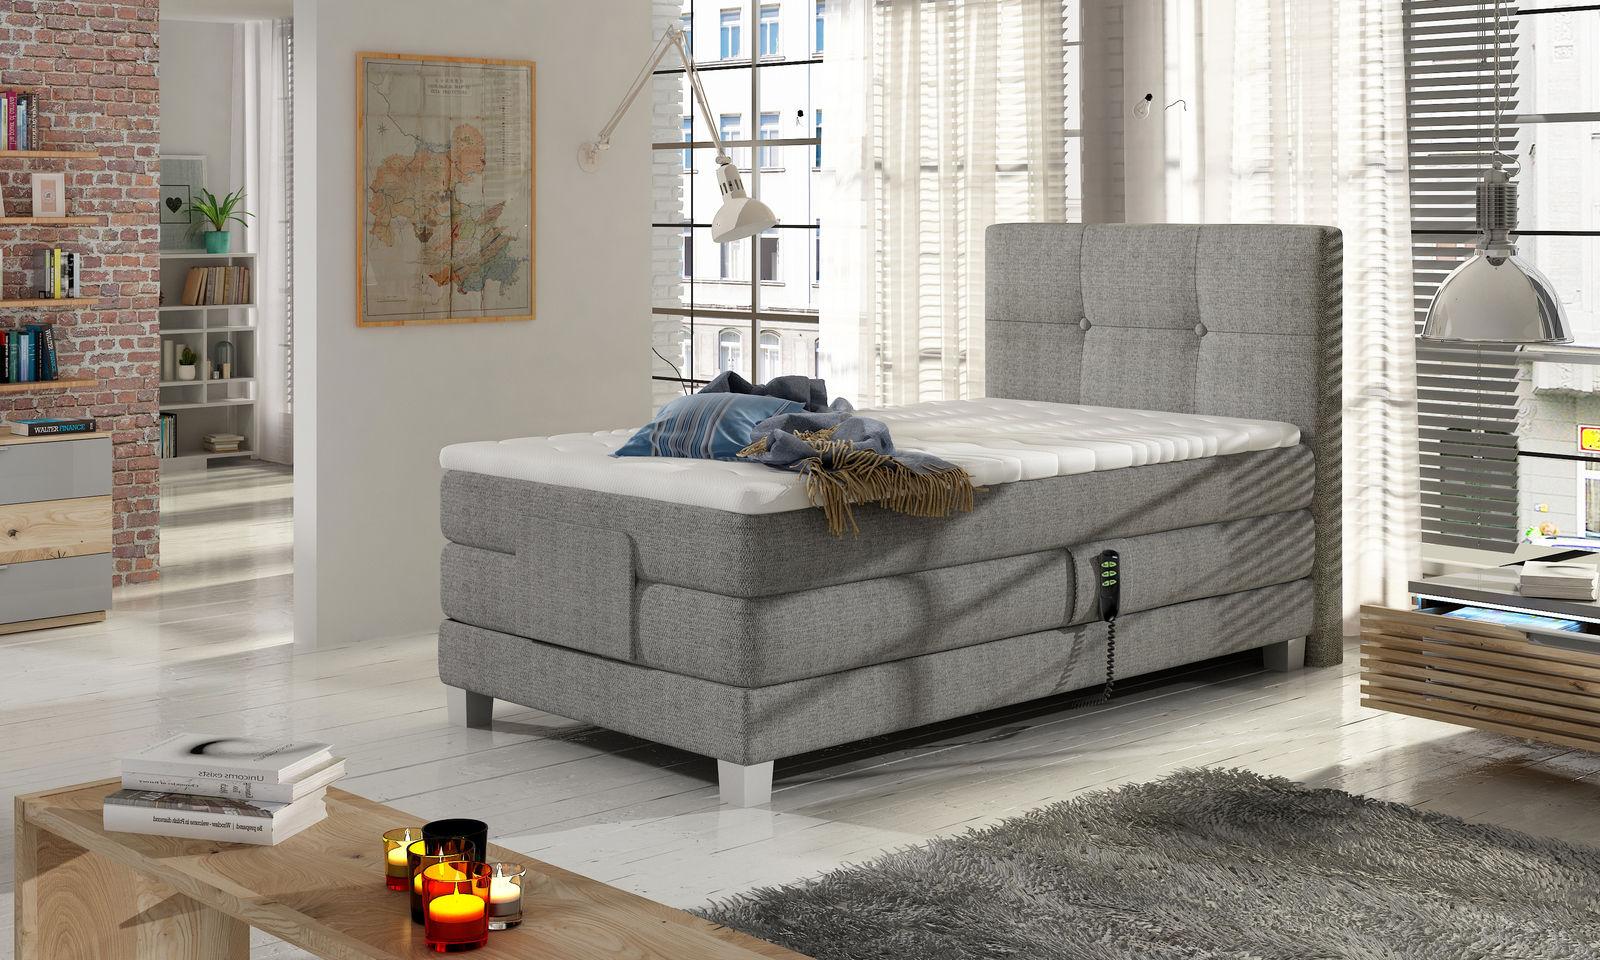 schlafzimmer betten boxspring betten. Black Bedroom Furniture Sets. Home Design Ideas